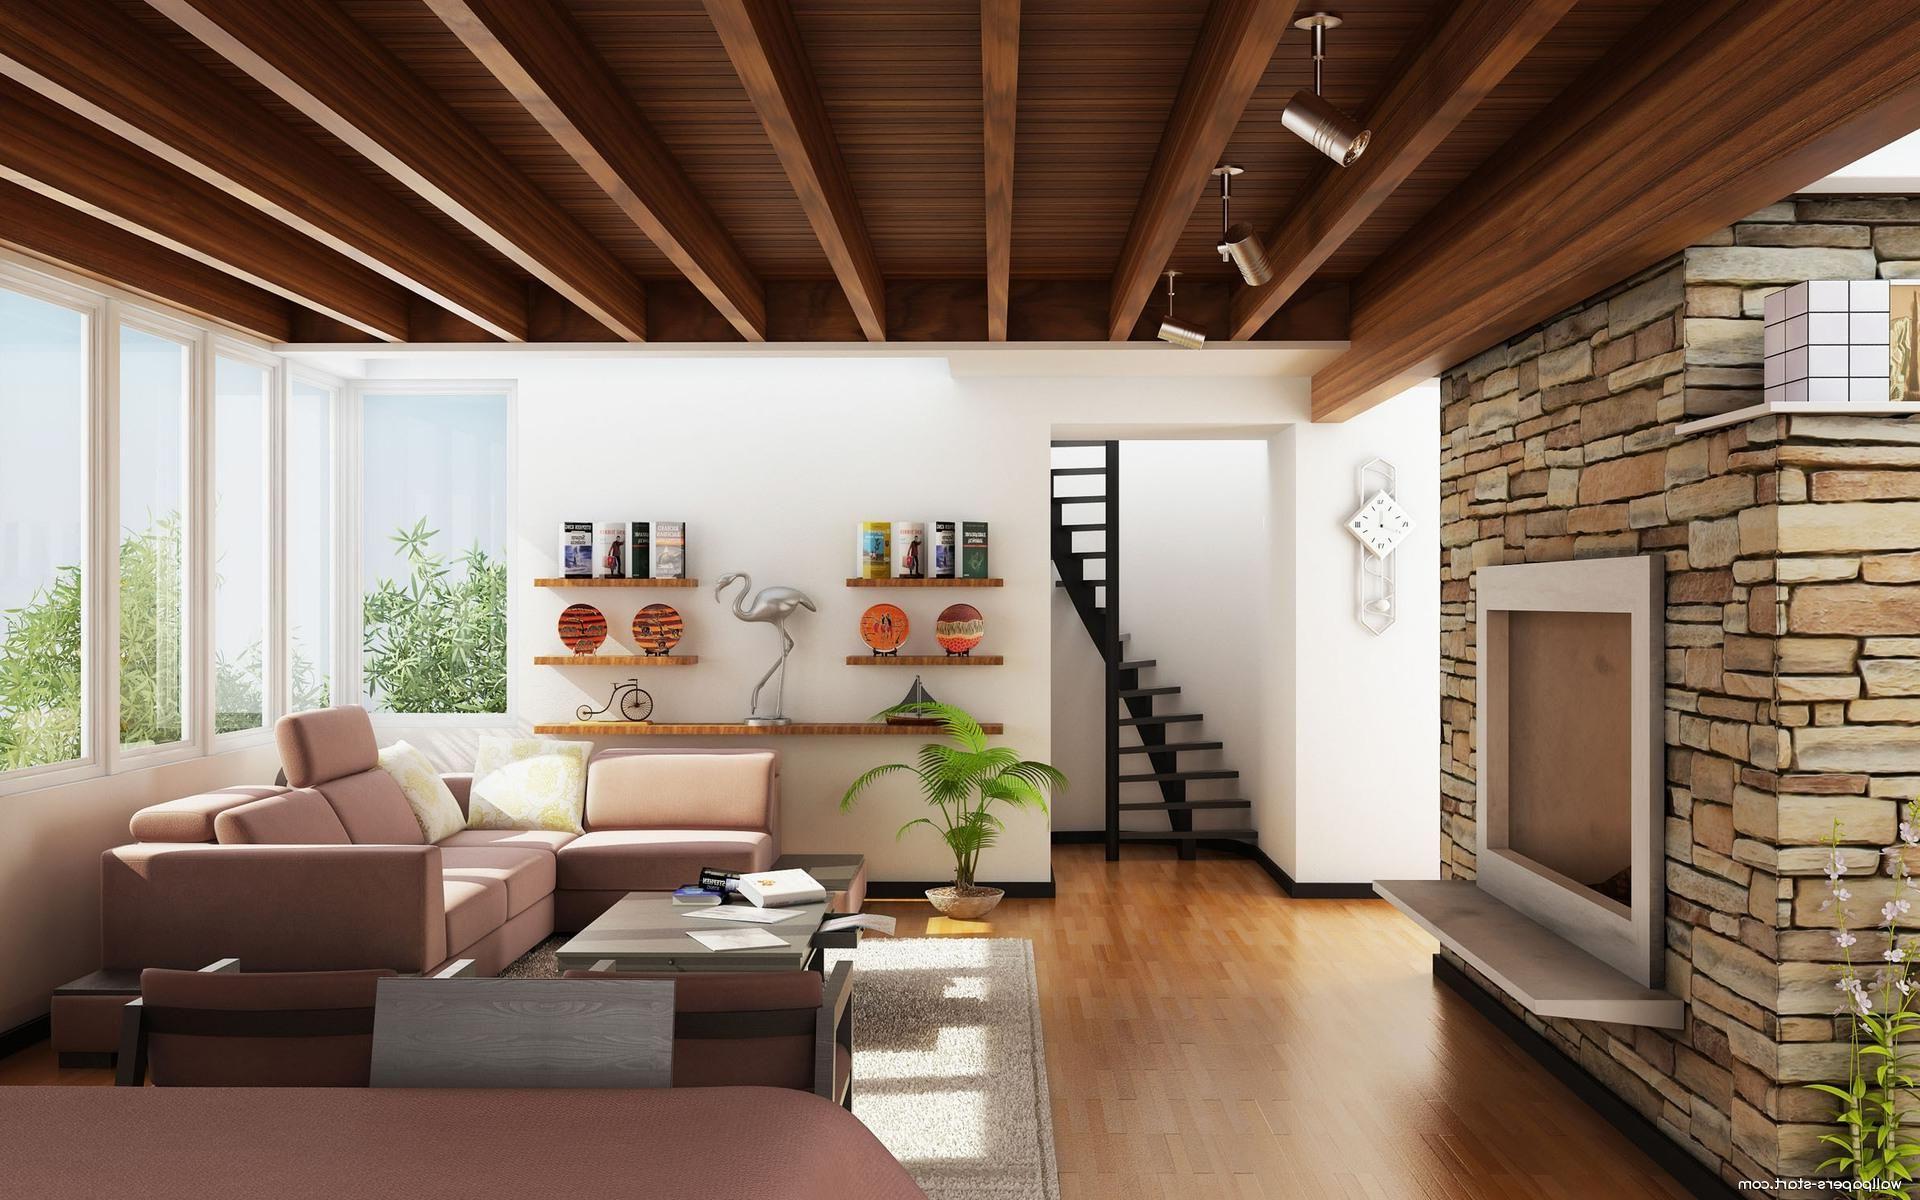 Wooden Ceiling Designs For Living Room | homeinteriors7